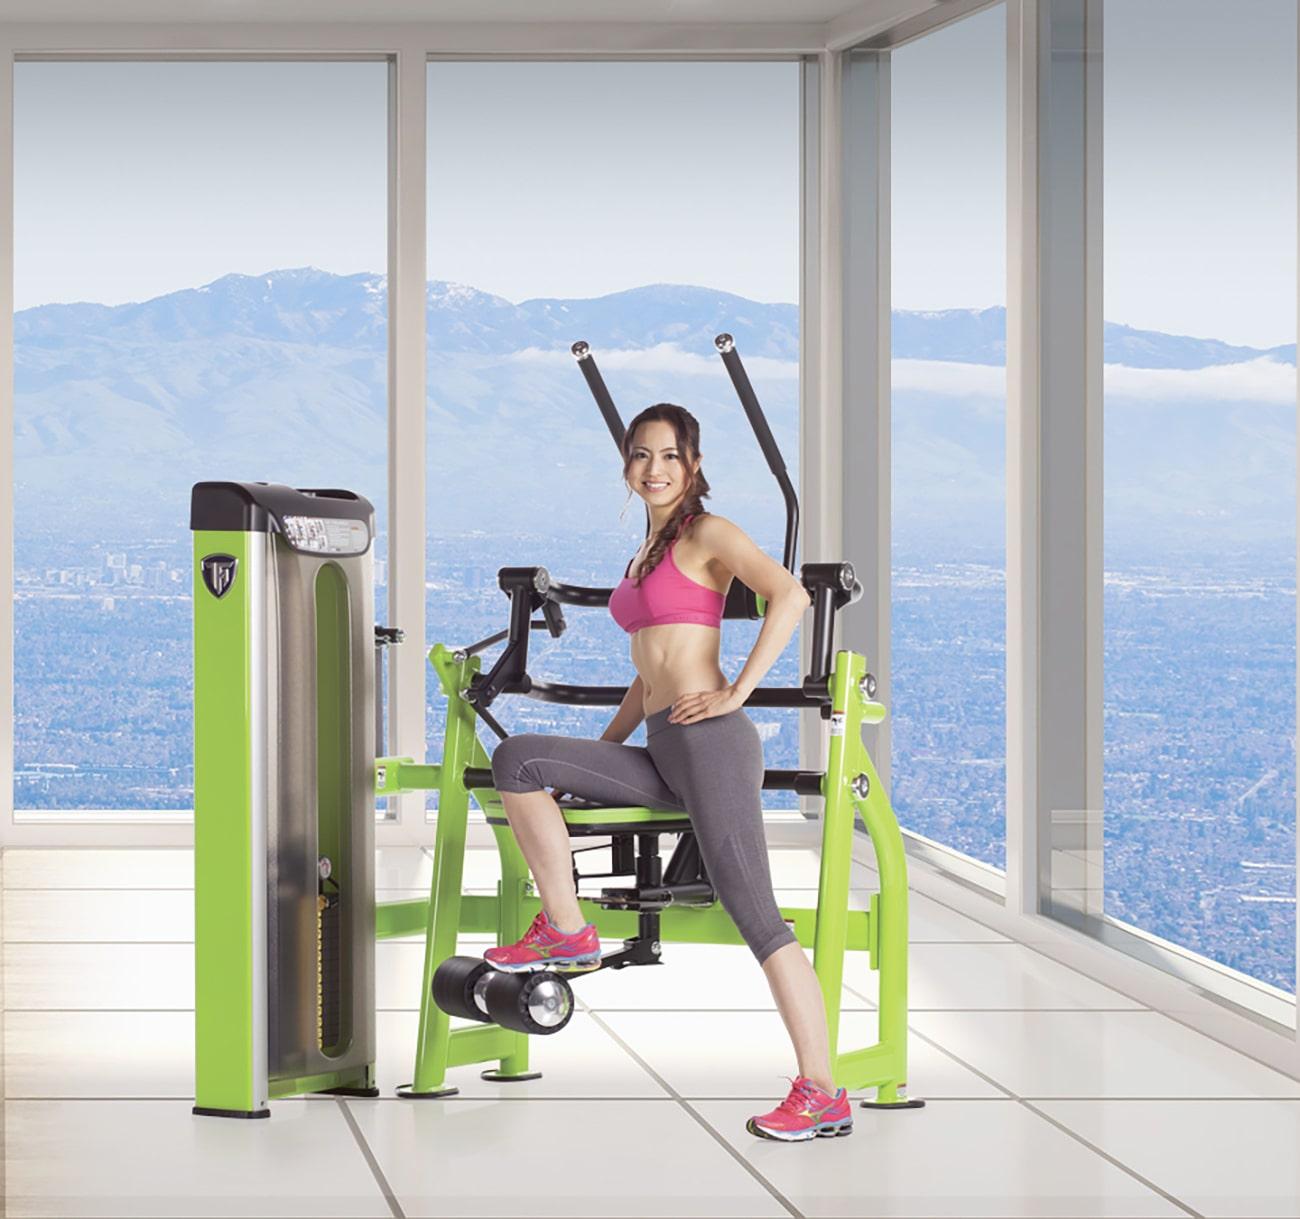 TuffStuff Fitness International | Strength Equipment